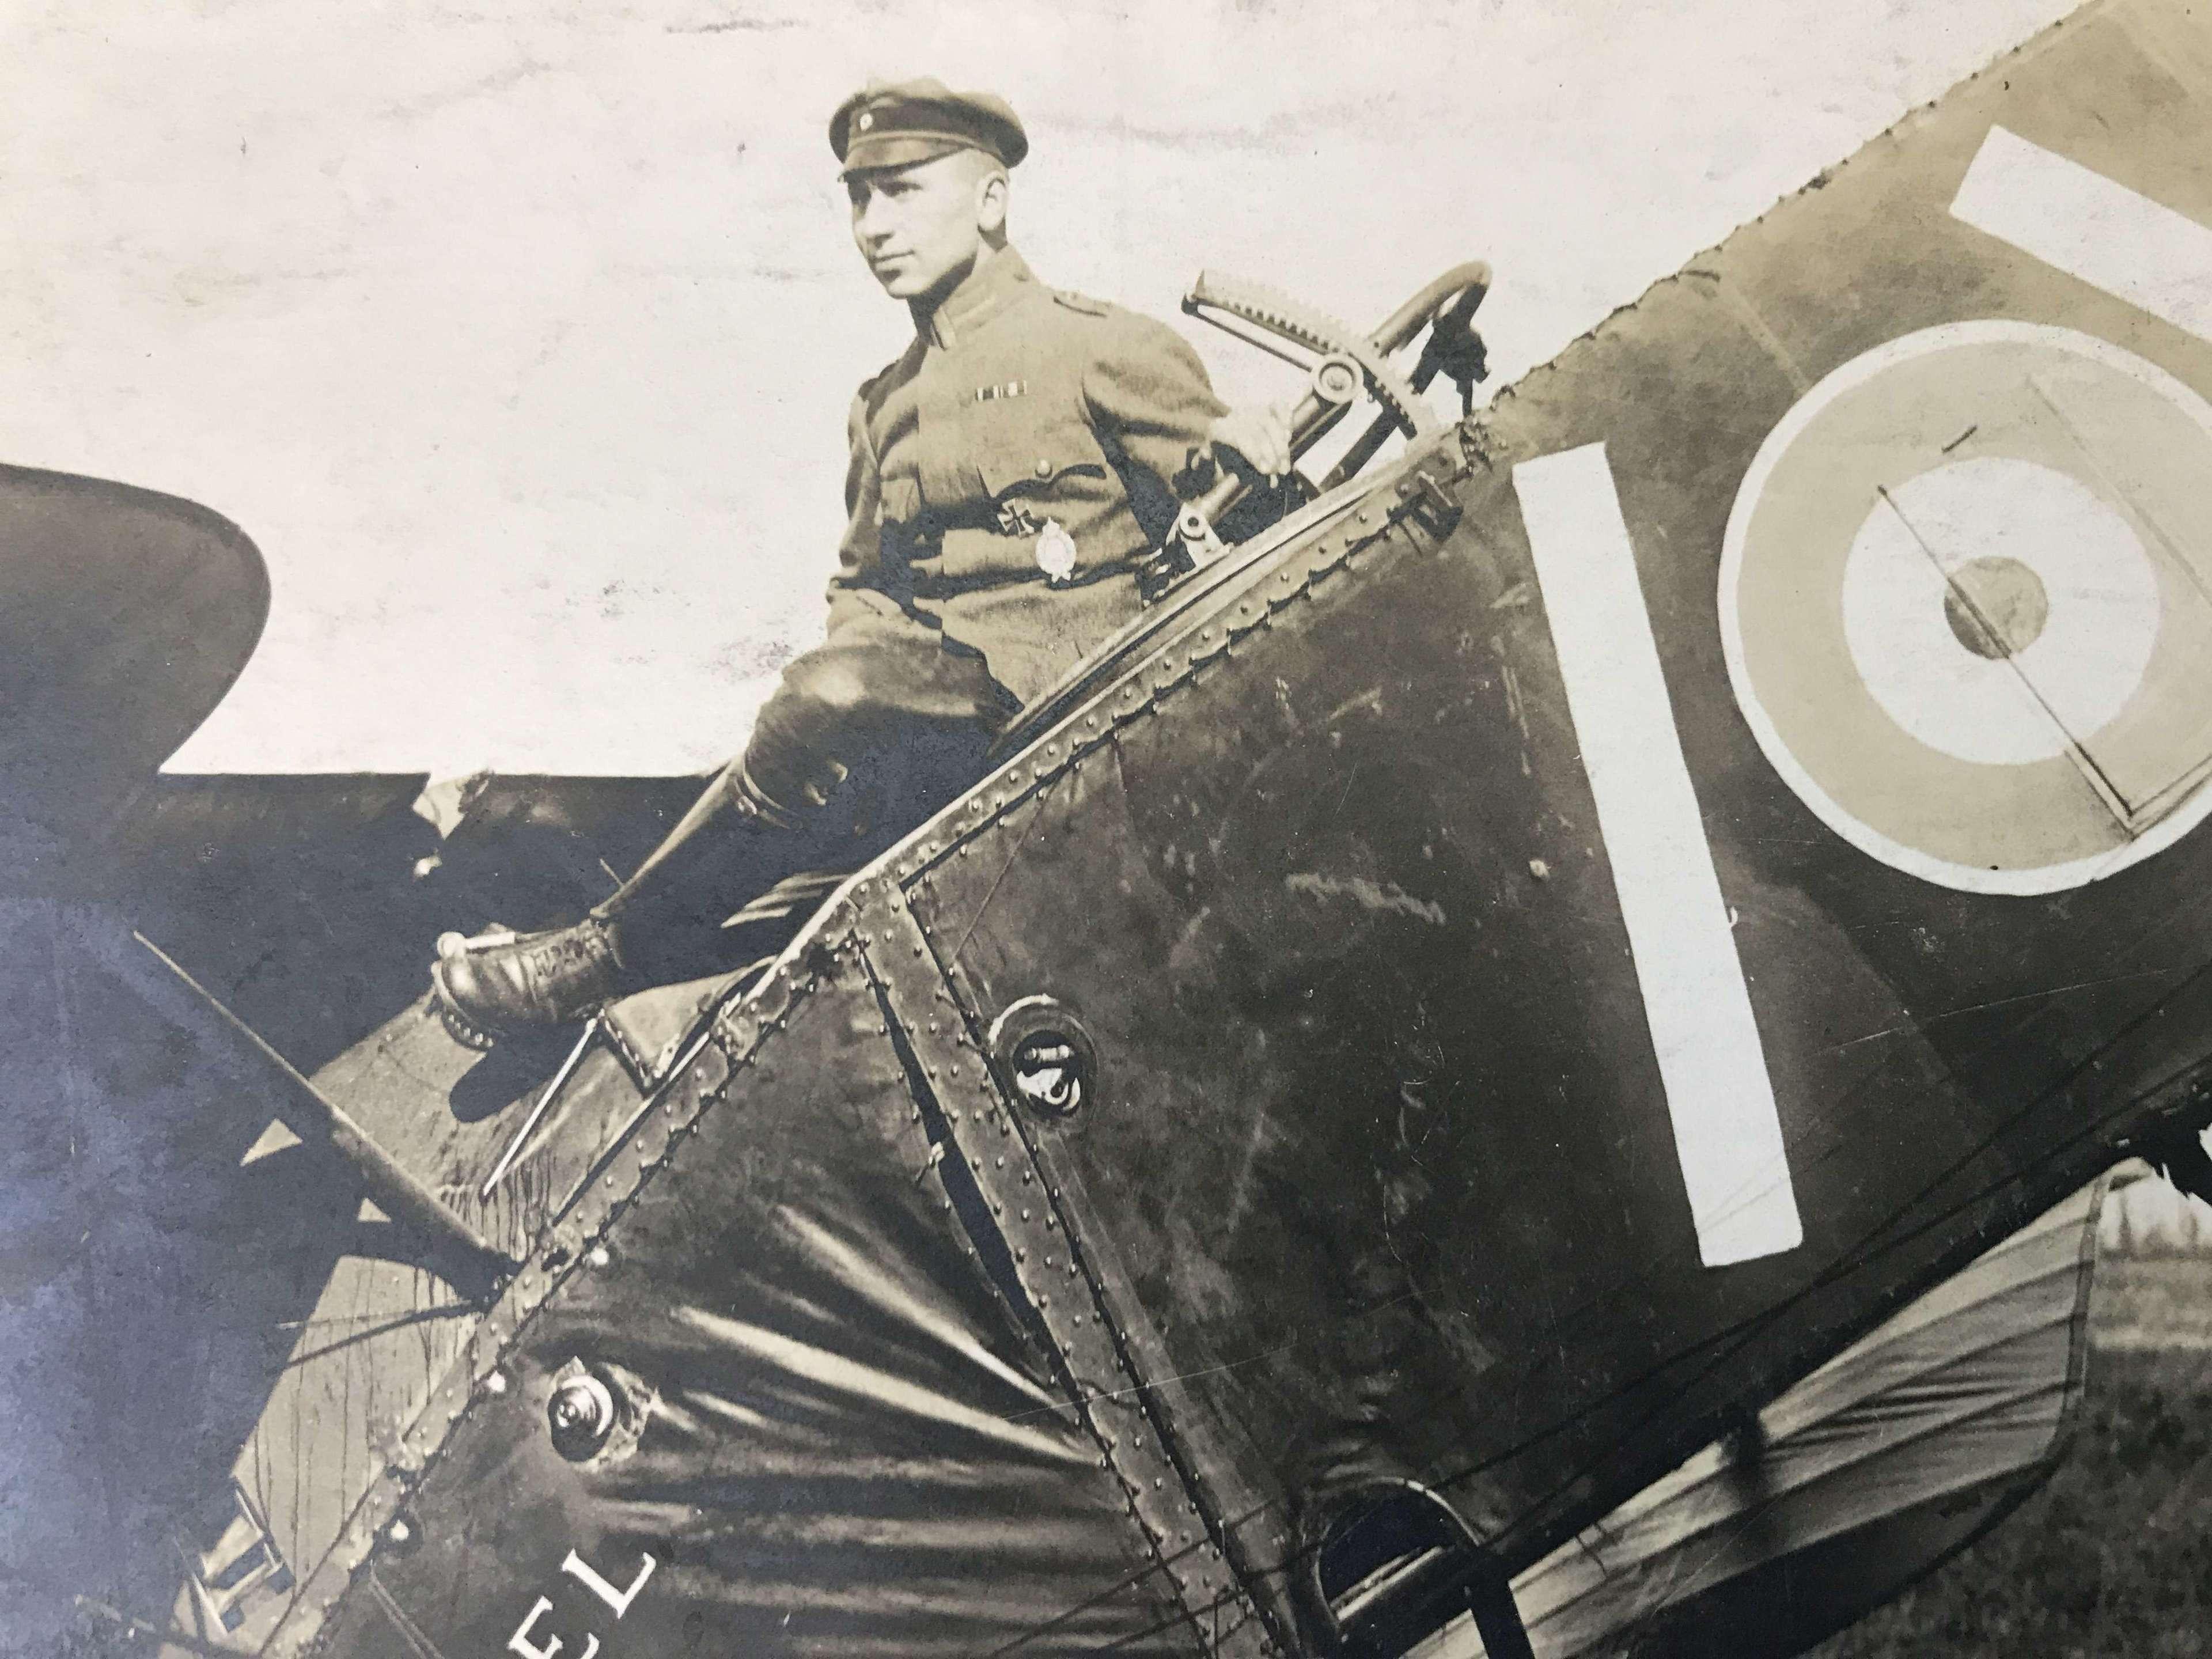 A Postcard Of a German pilot sitting on a Bristol fighter